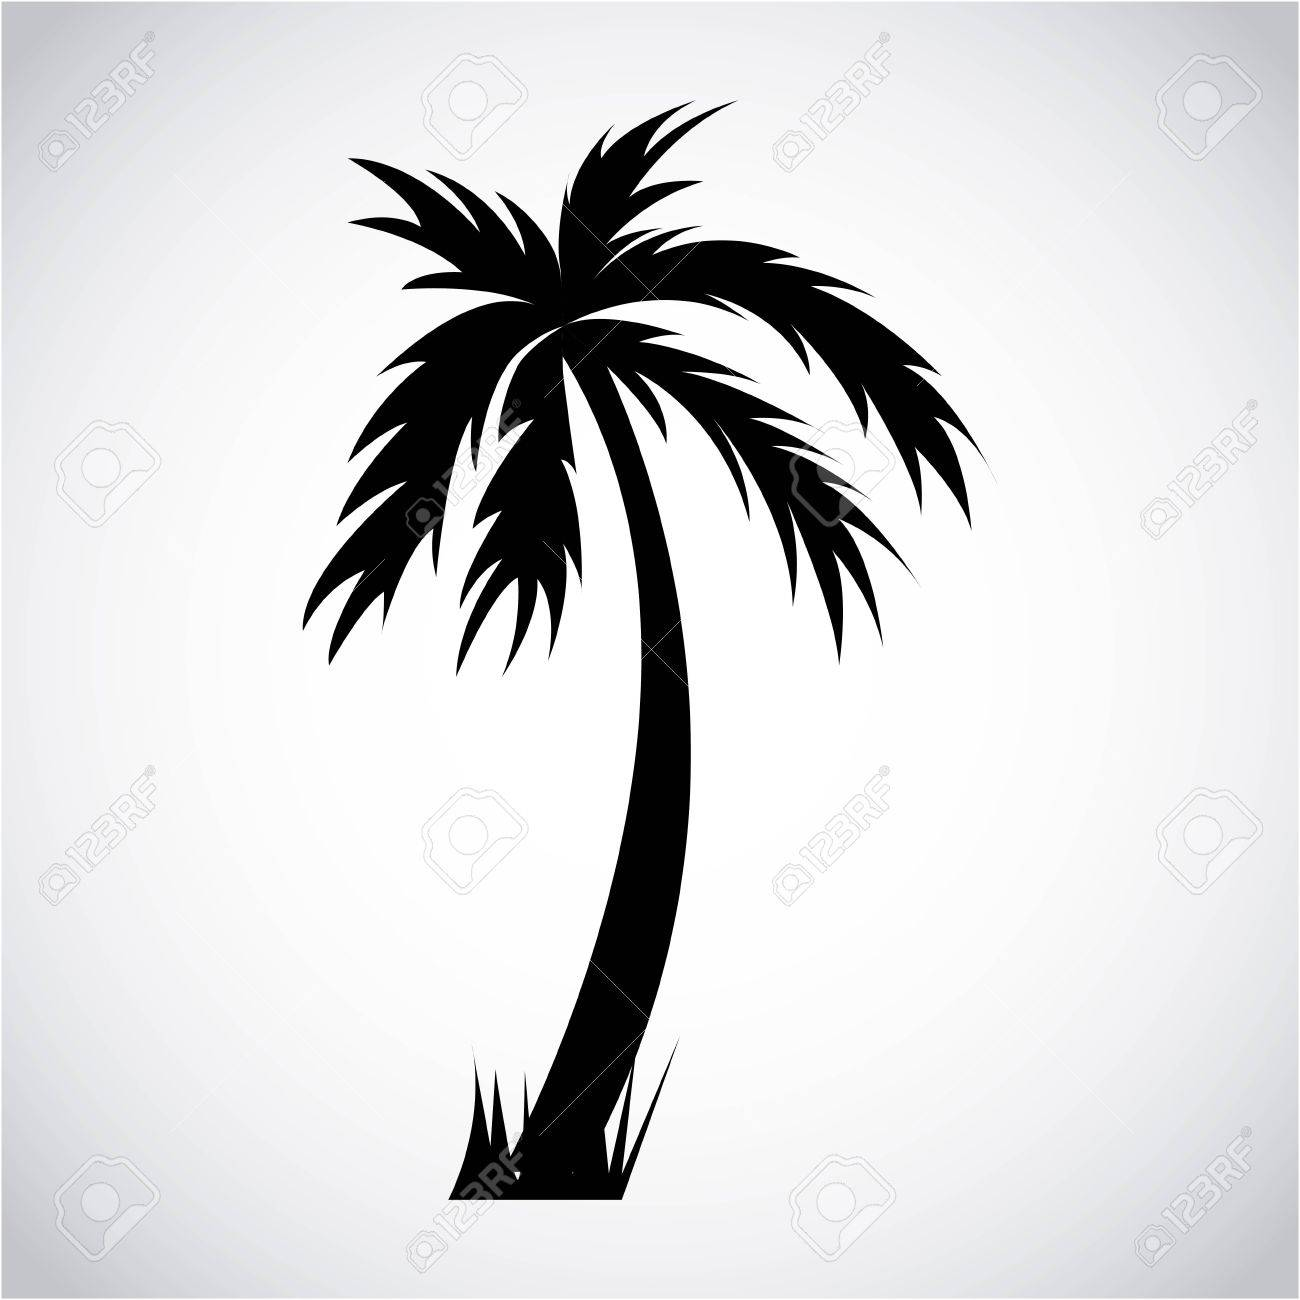 tree palm graphic design , vector illustration - 32484061